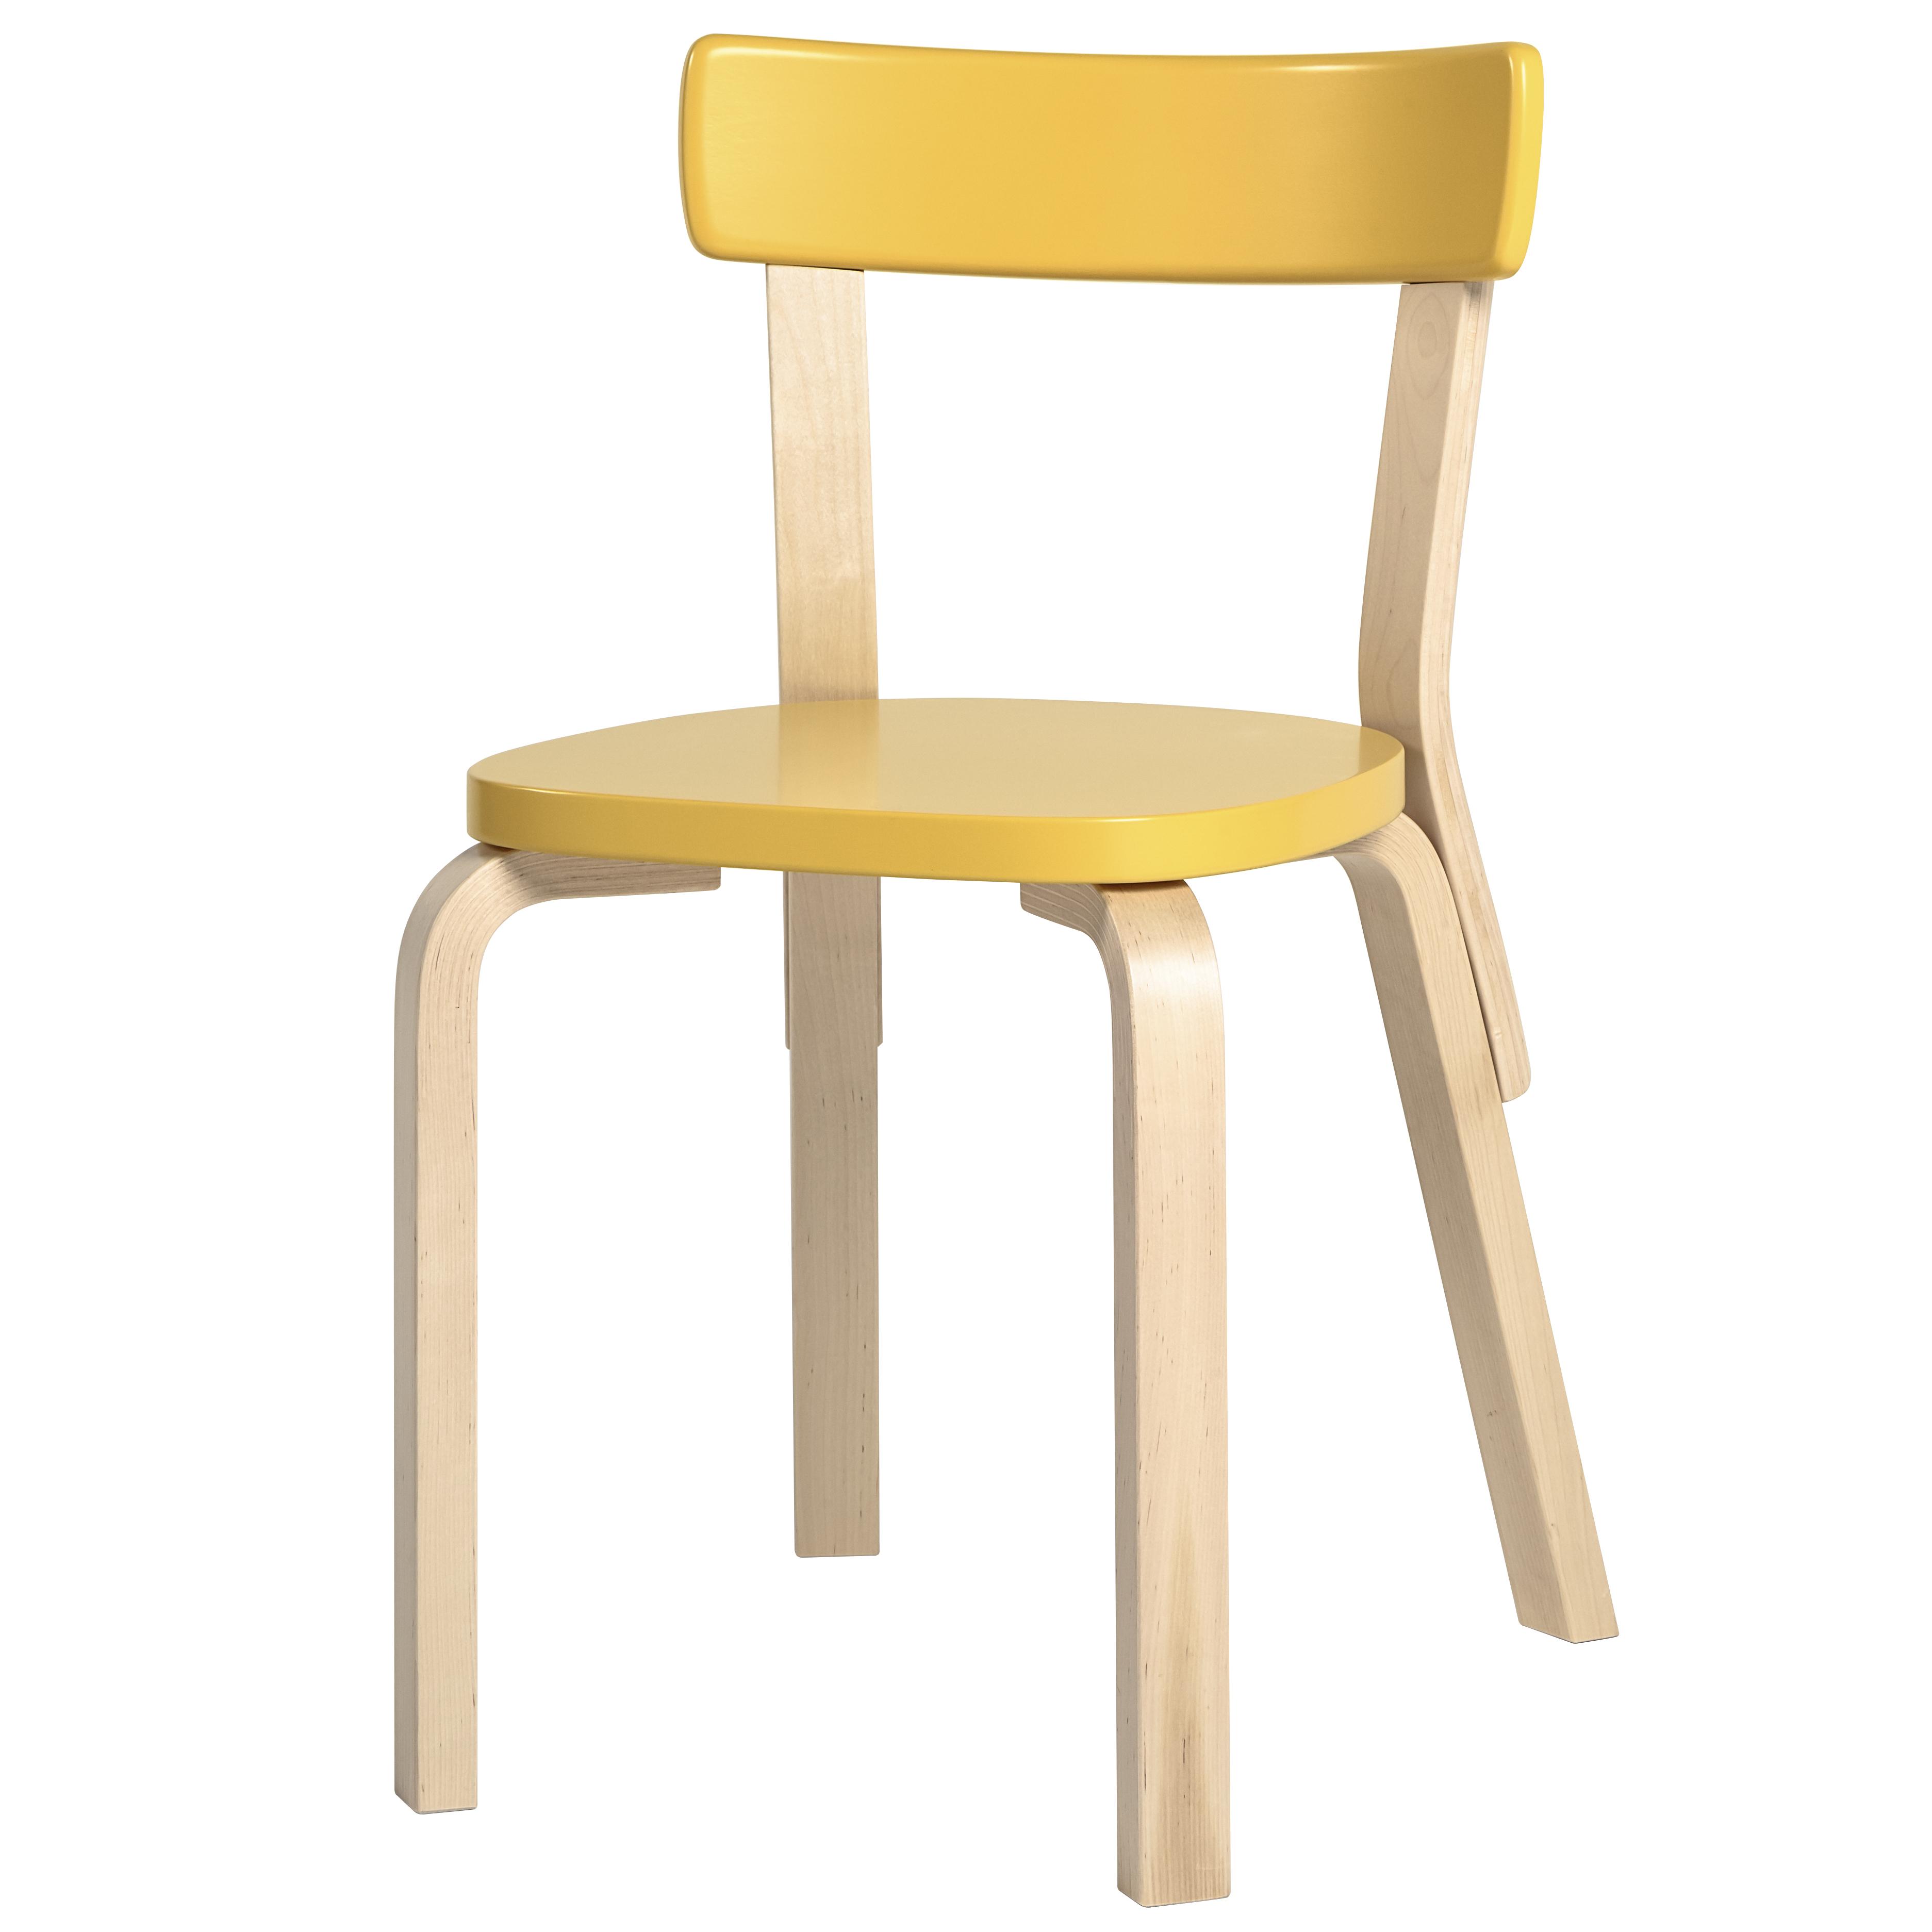 Artek Chaise 69 Design Alvar Aalto